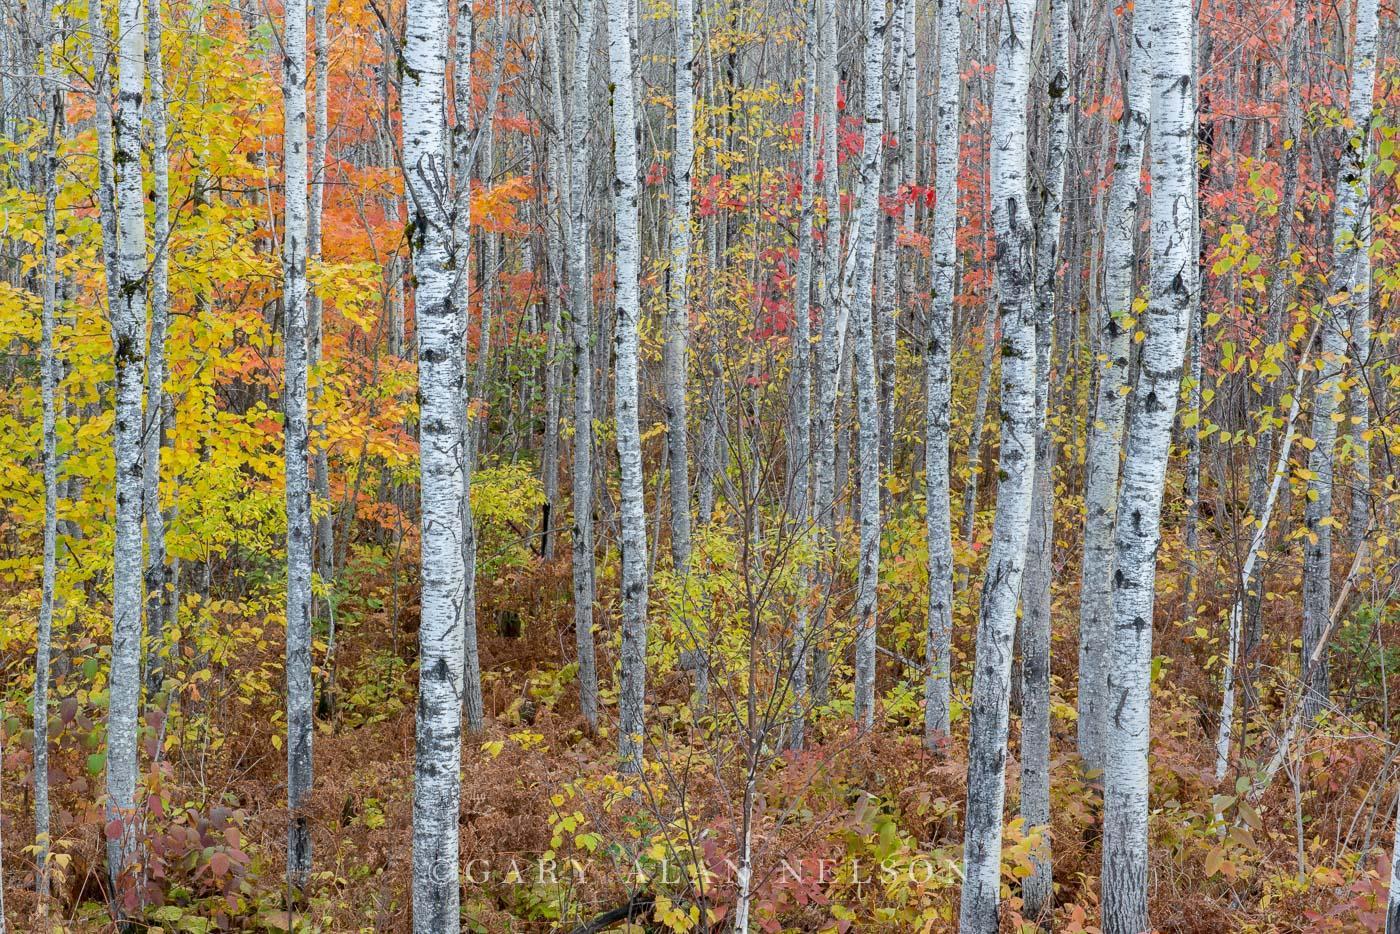 Aspens,Superior National Forest,autumn,minnesota, photo